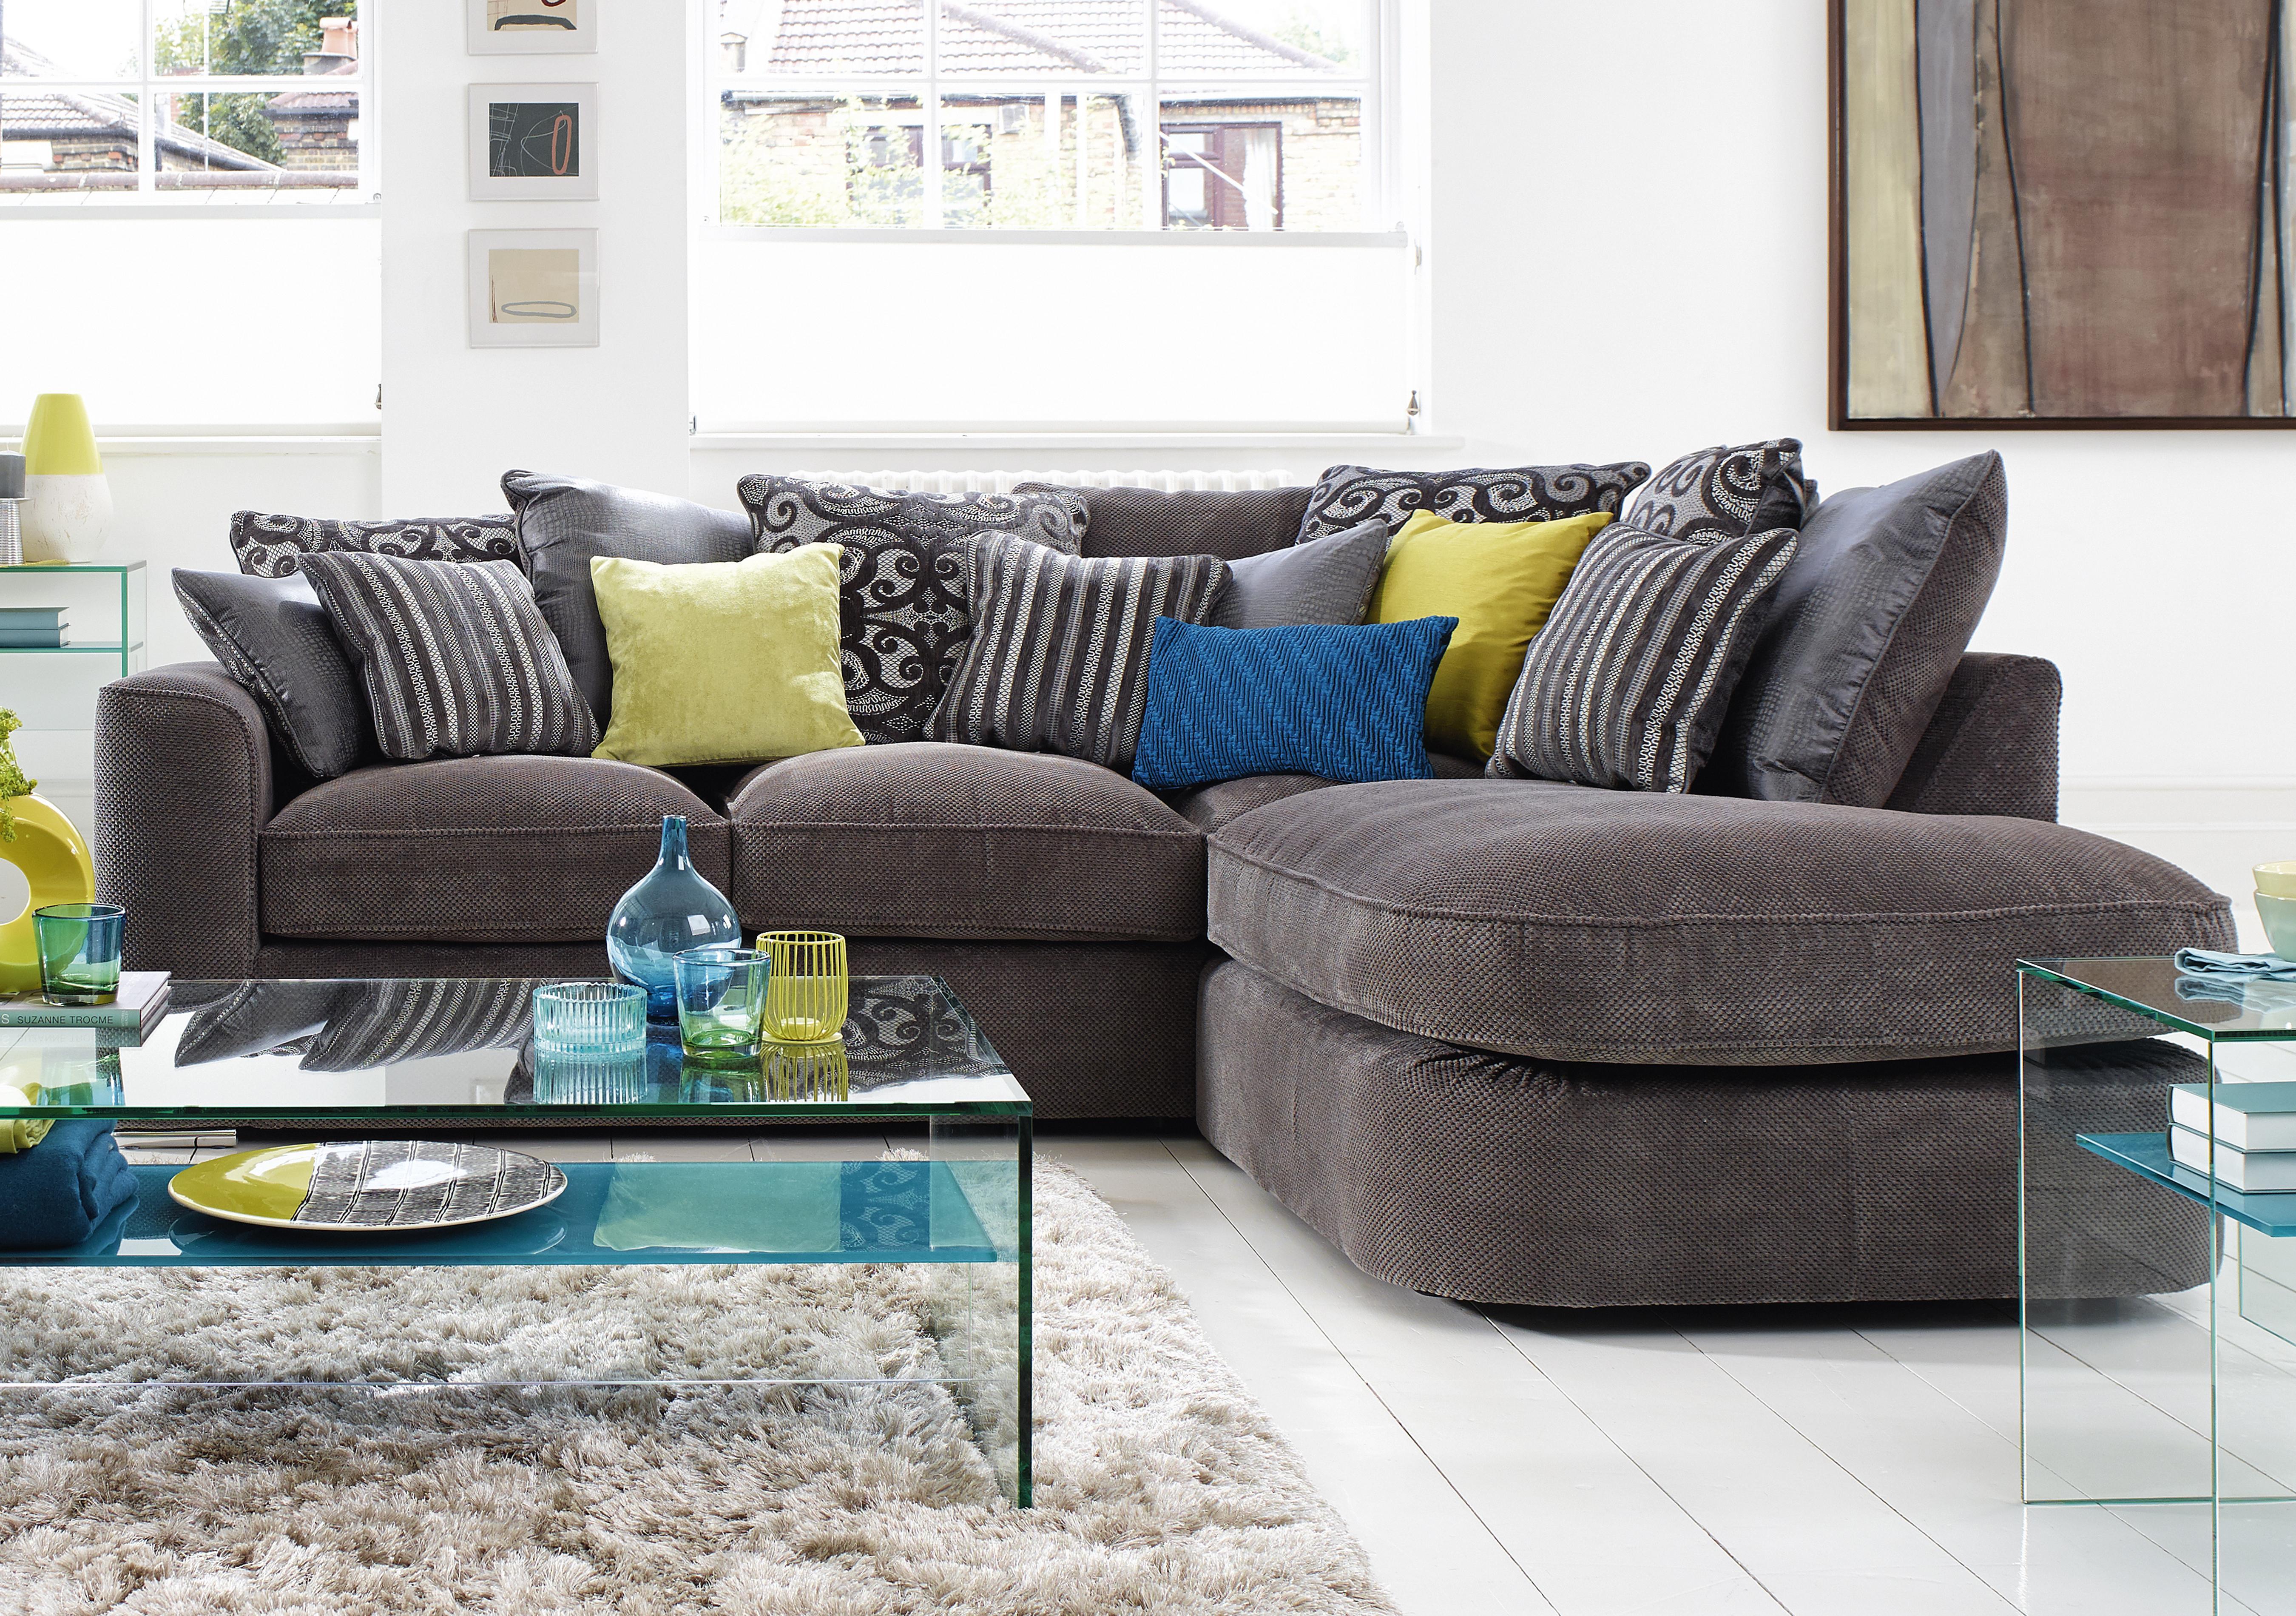 Furniture Village Boardwalk perfect furniture village dune sofa comfy modern living room with